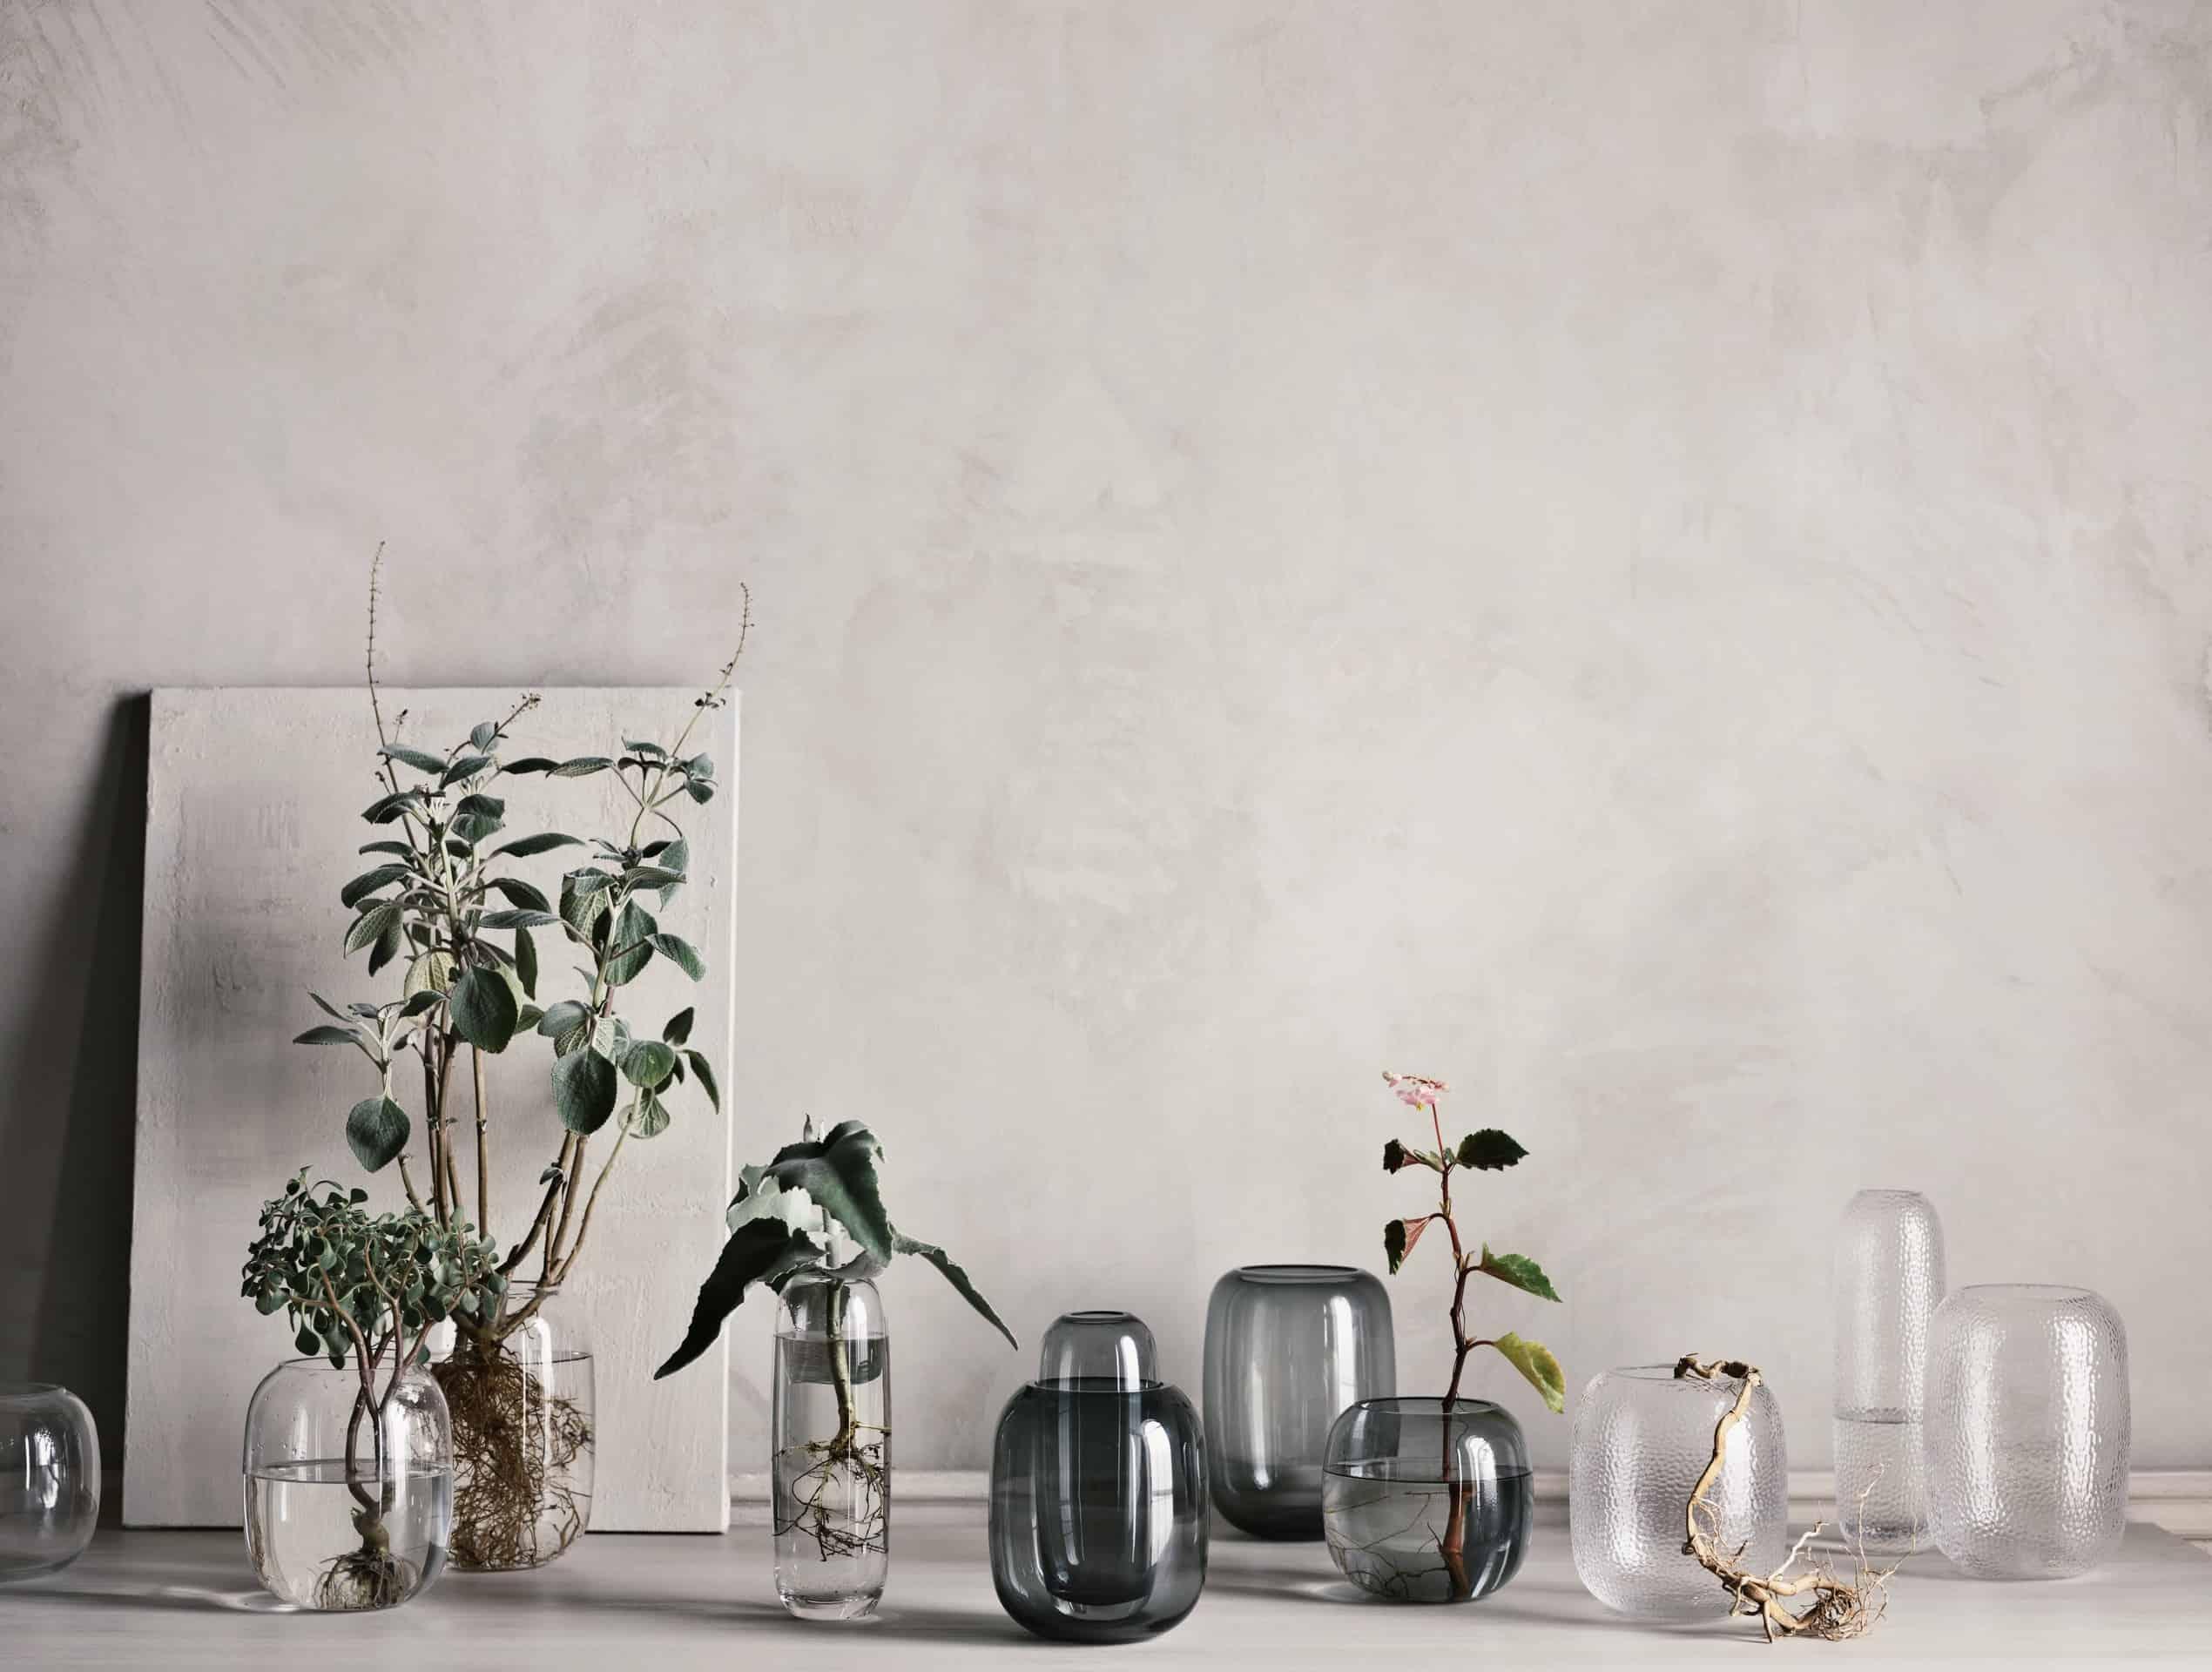 Una vases